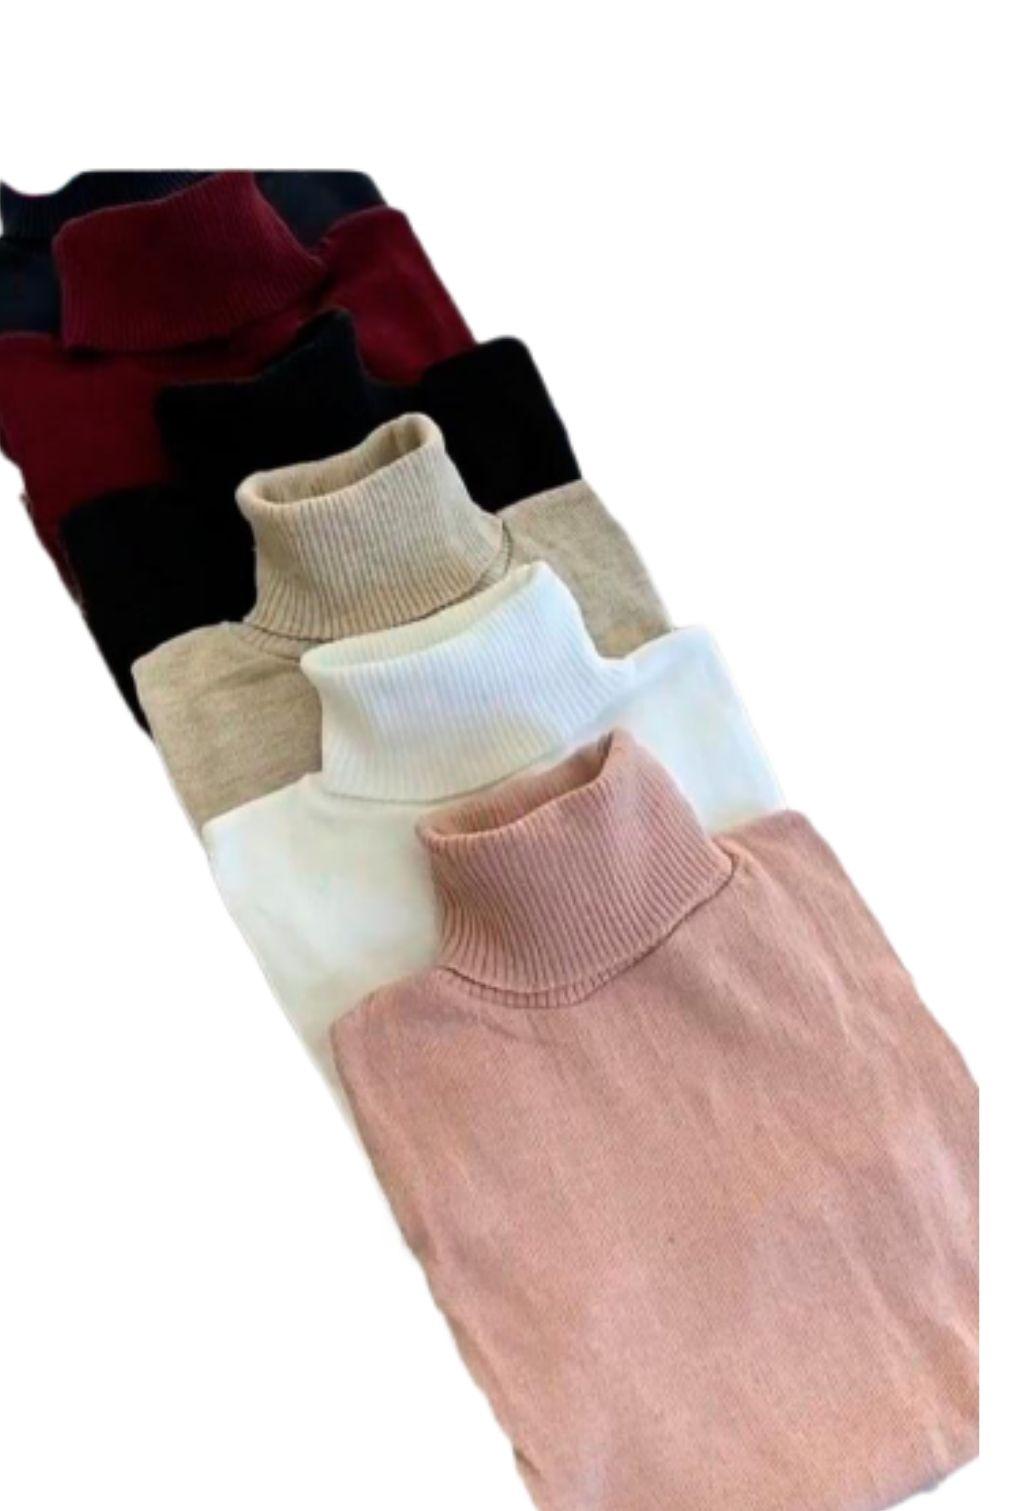 Blusa Cacharrel Feminina Tricot Lã Gola Alta Inverno 2021  - ModaStore | Moda Feminina